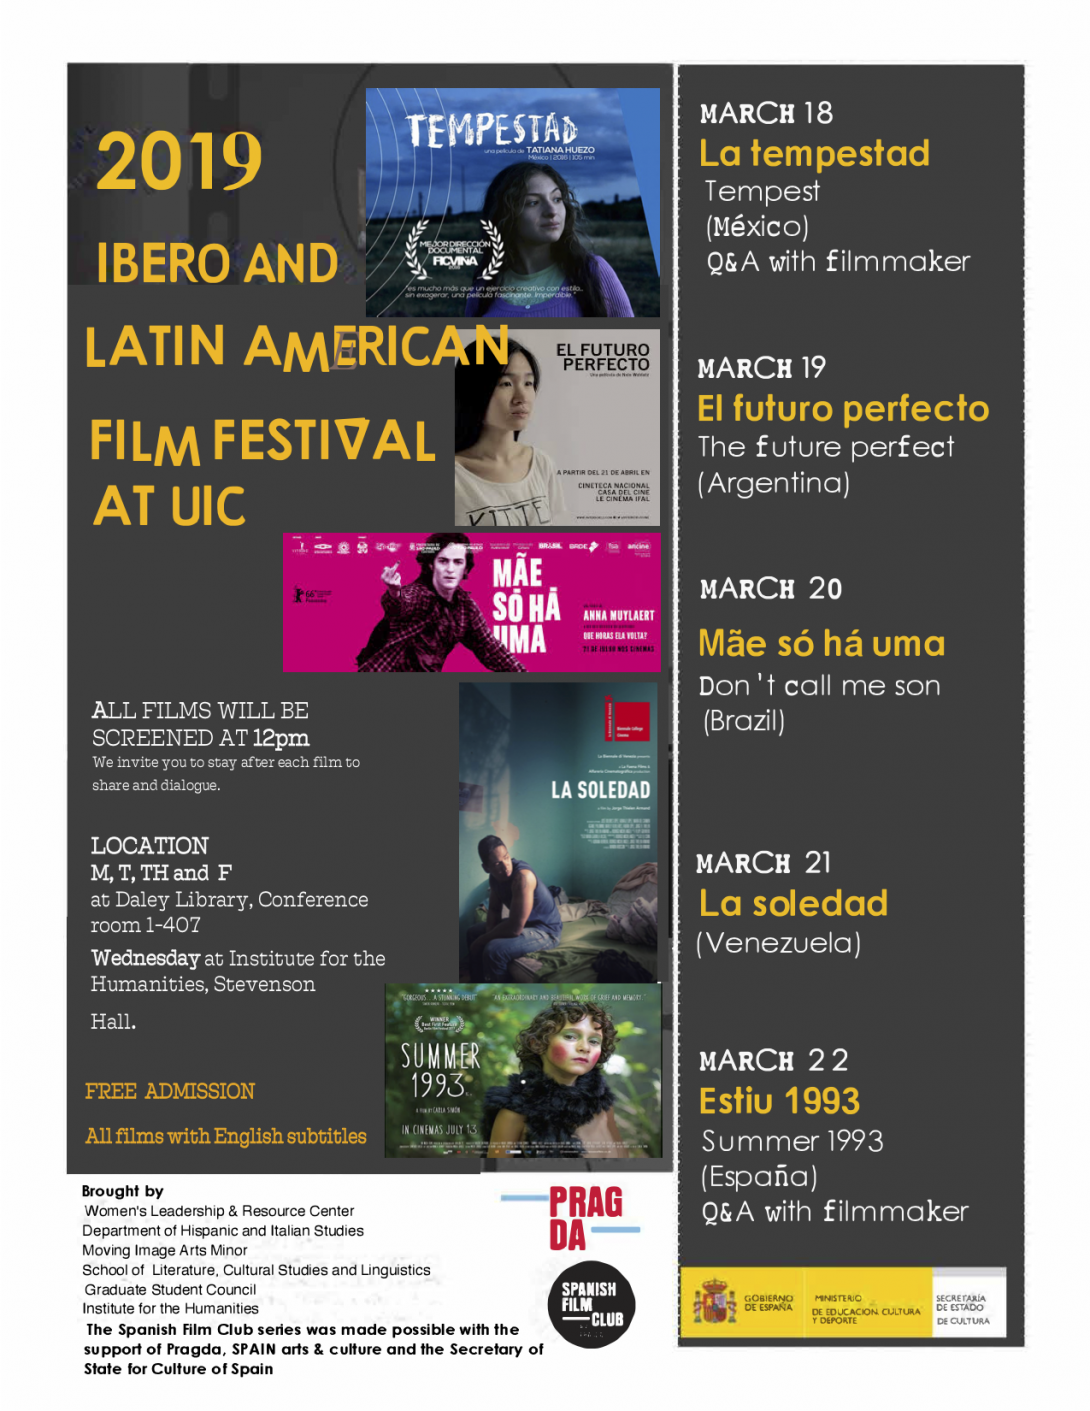 Ibero and Latin American Film Festival